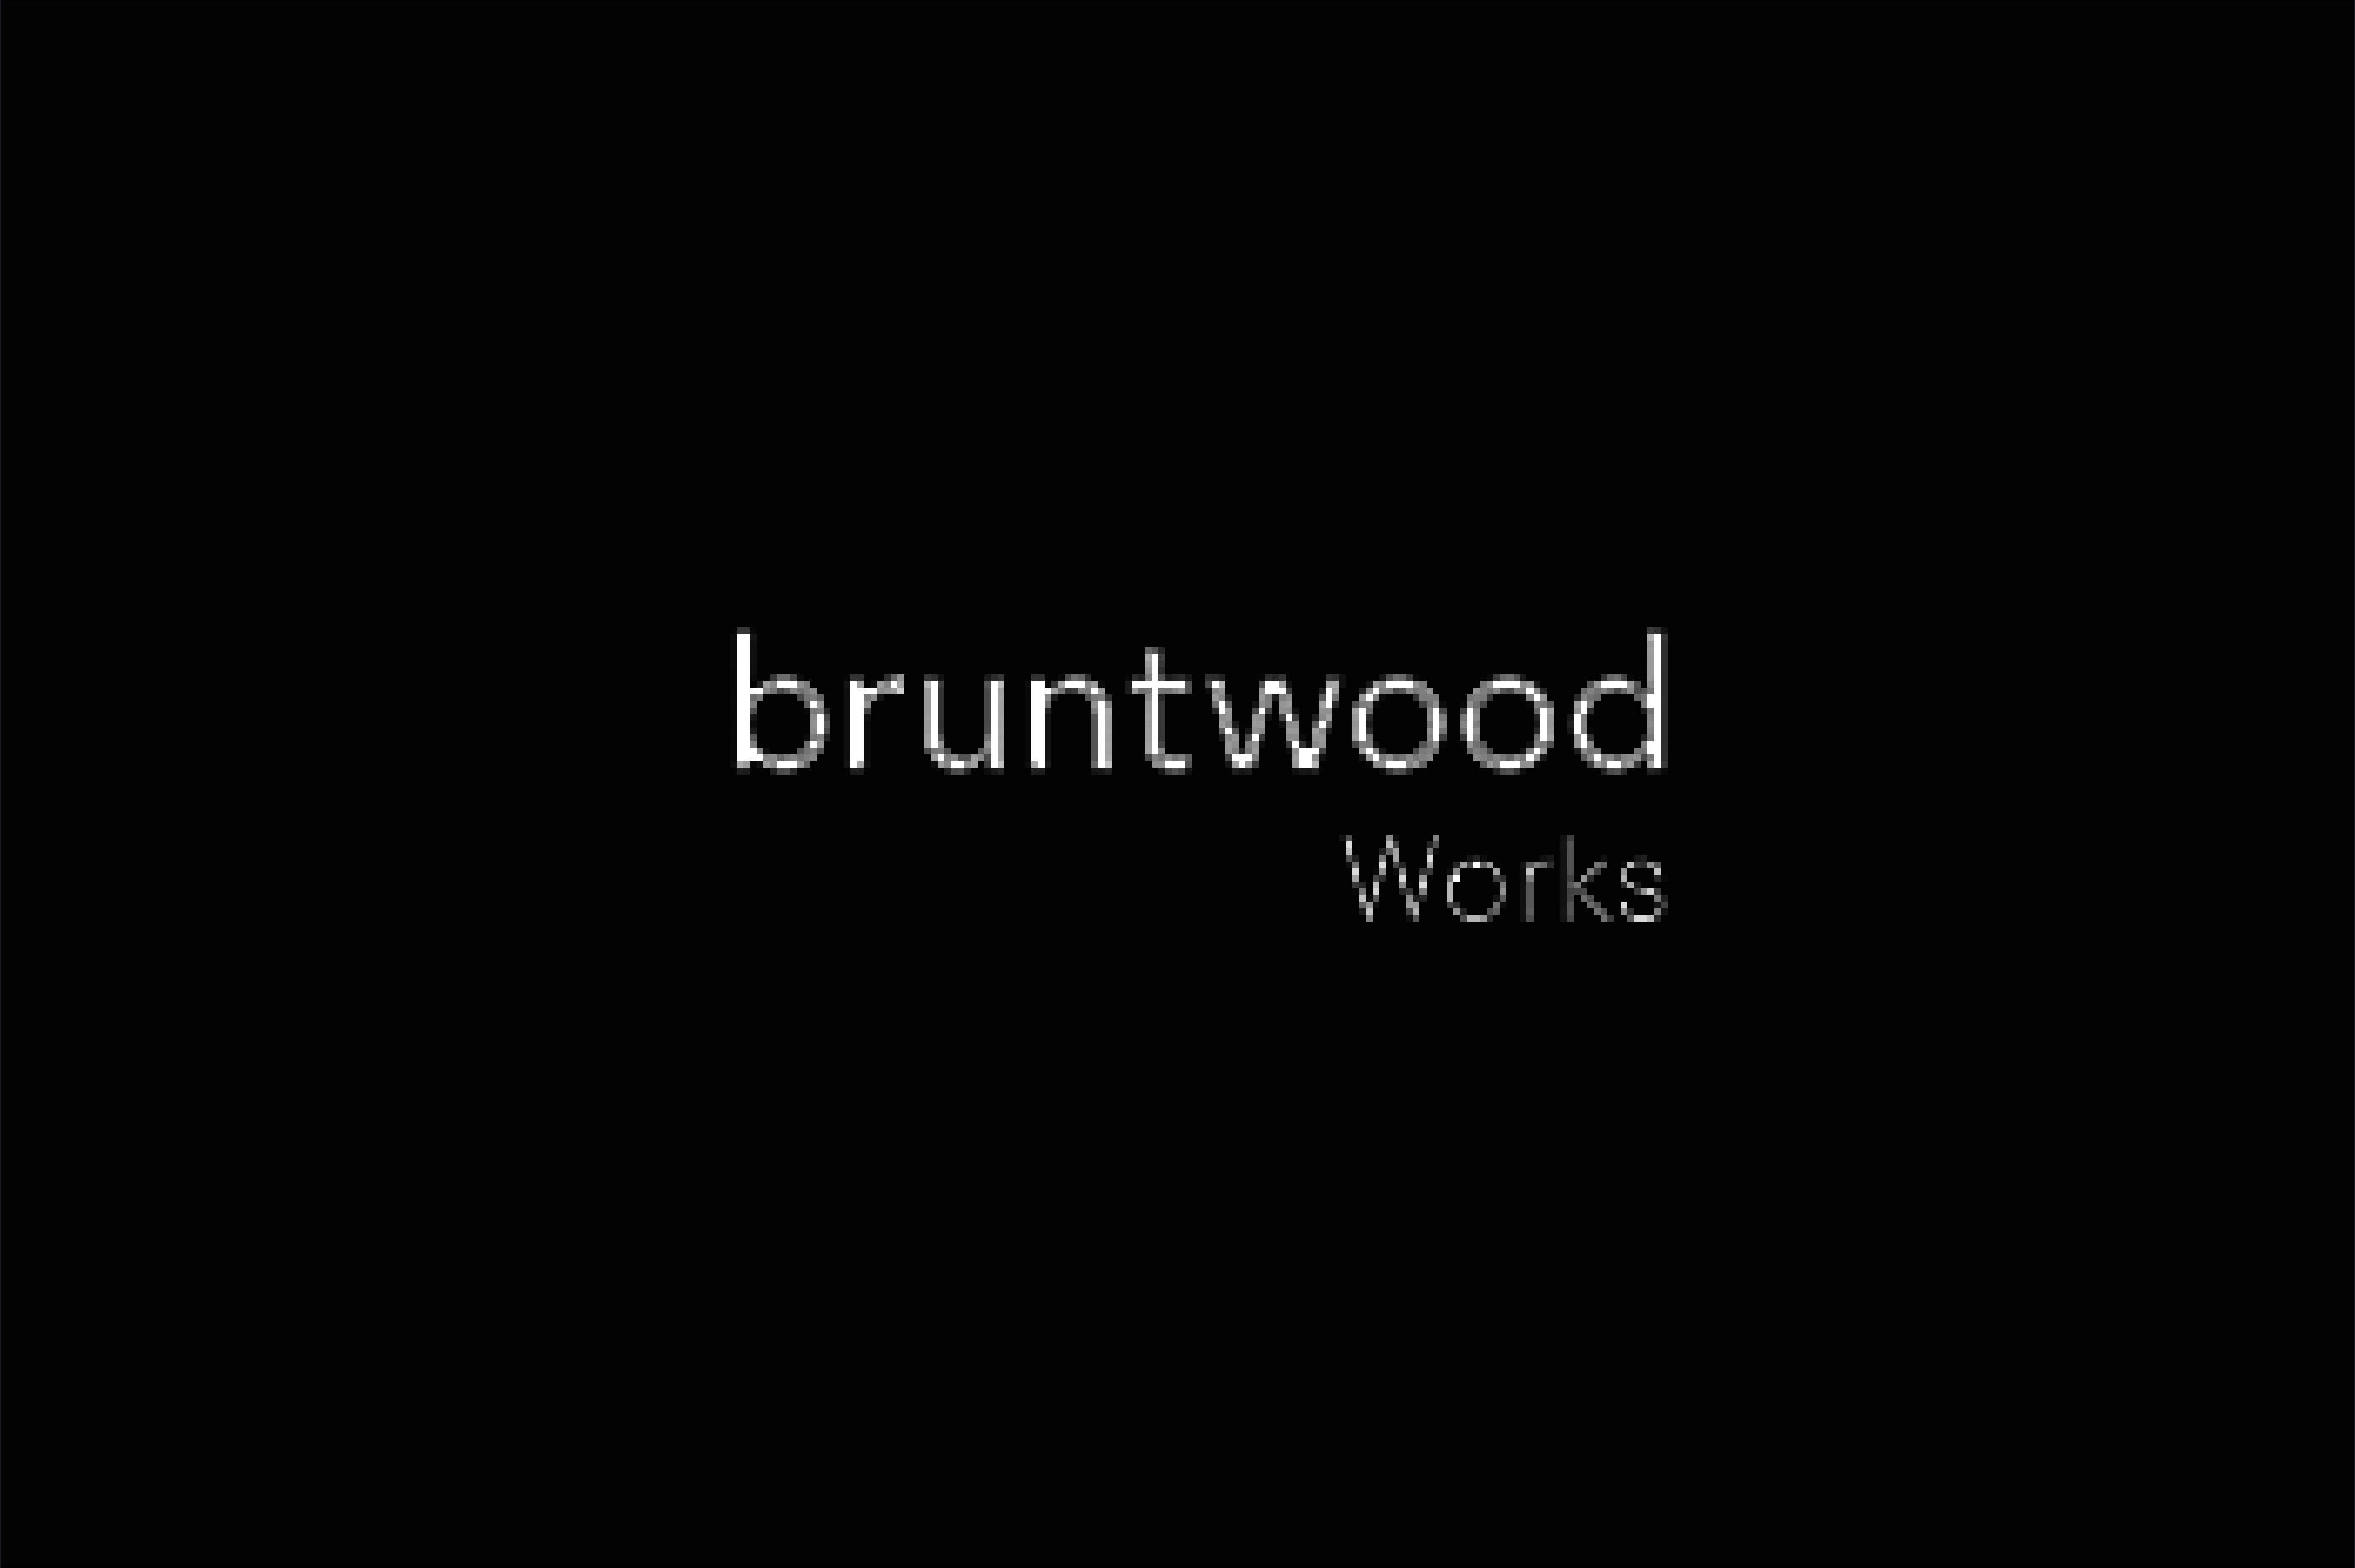 Bruntwood Works